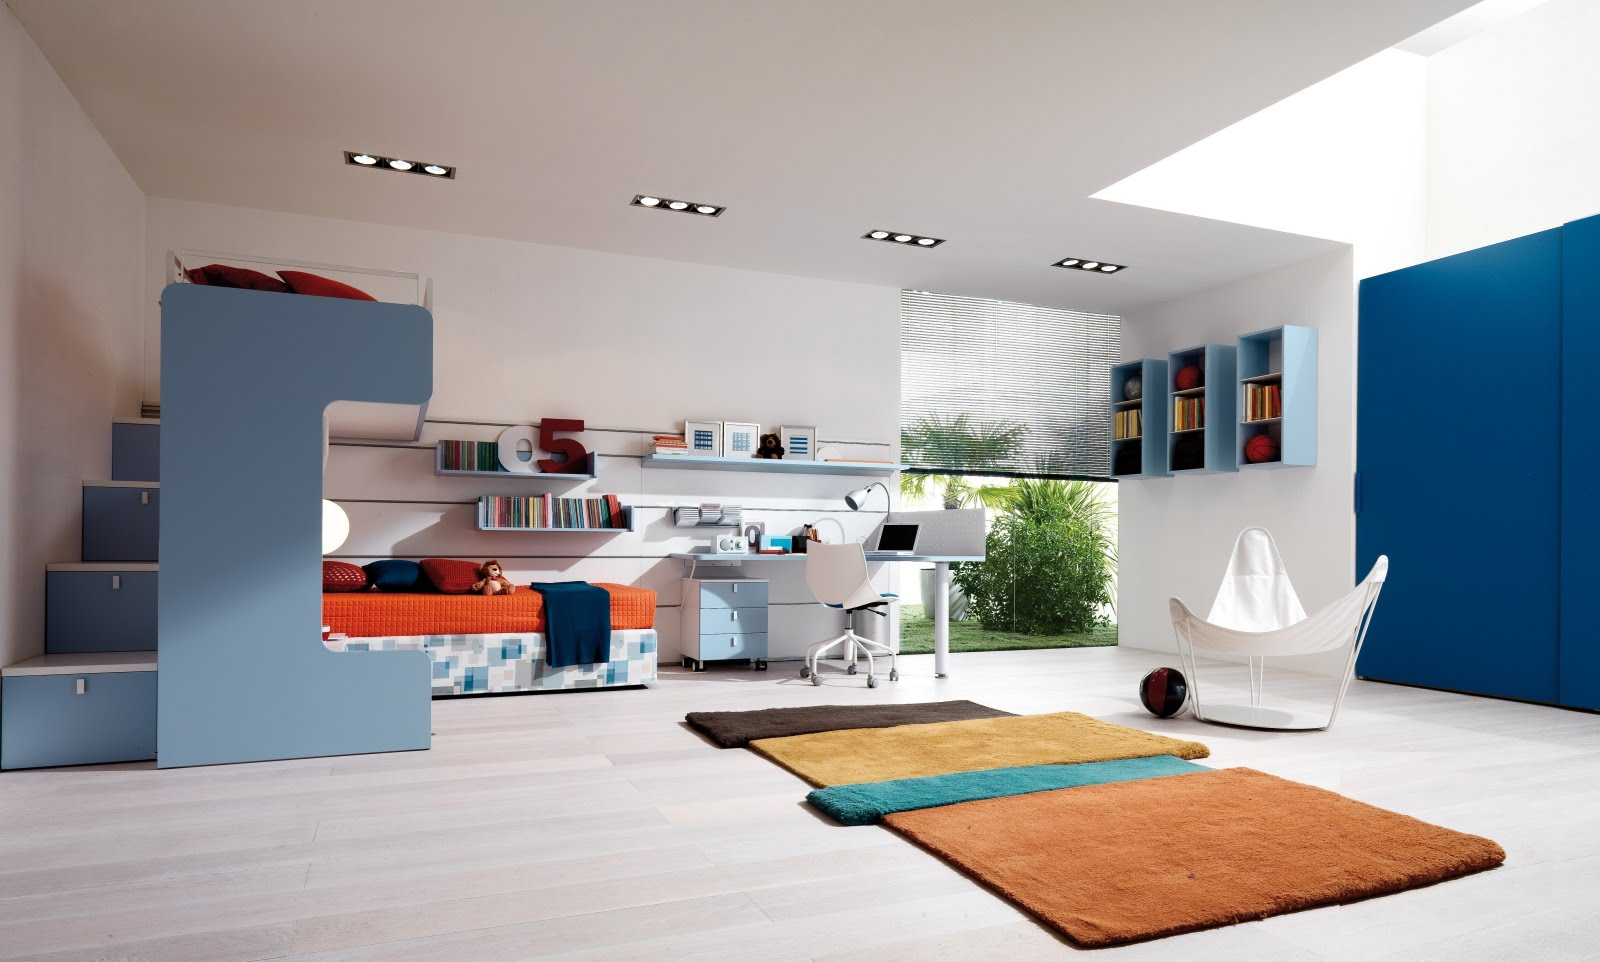 Teenage Room Decor Ideas | My Decorative on Teen Decor  id=90025